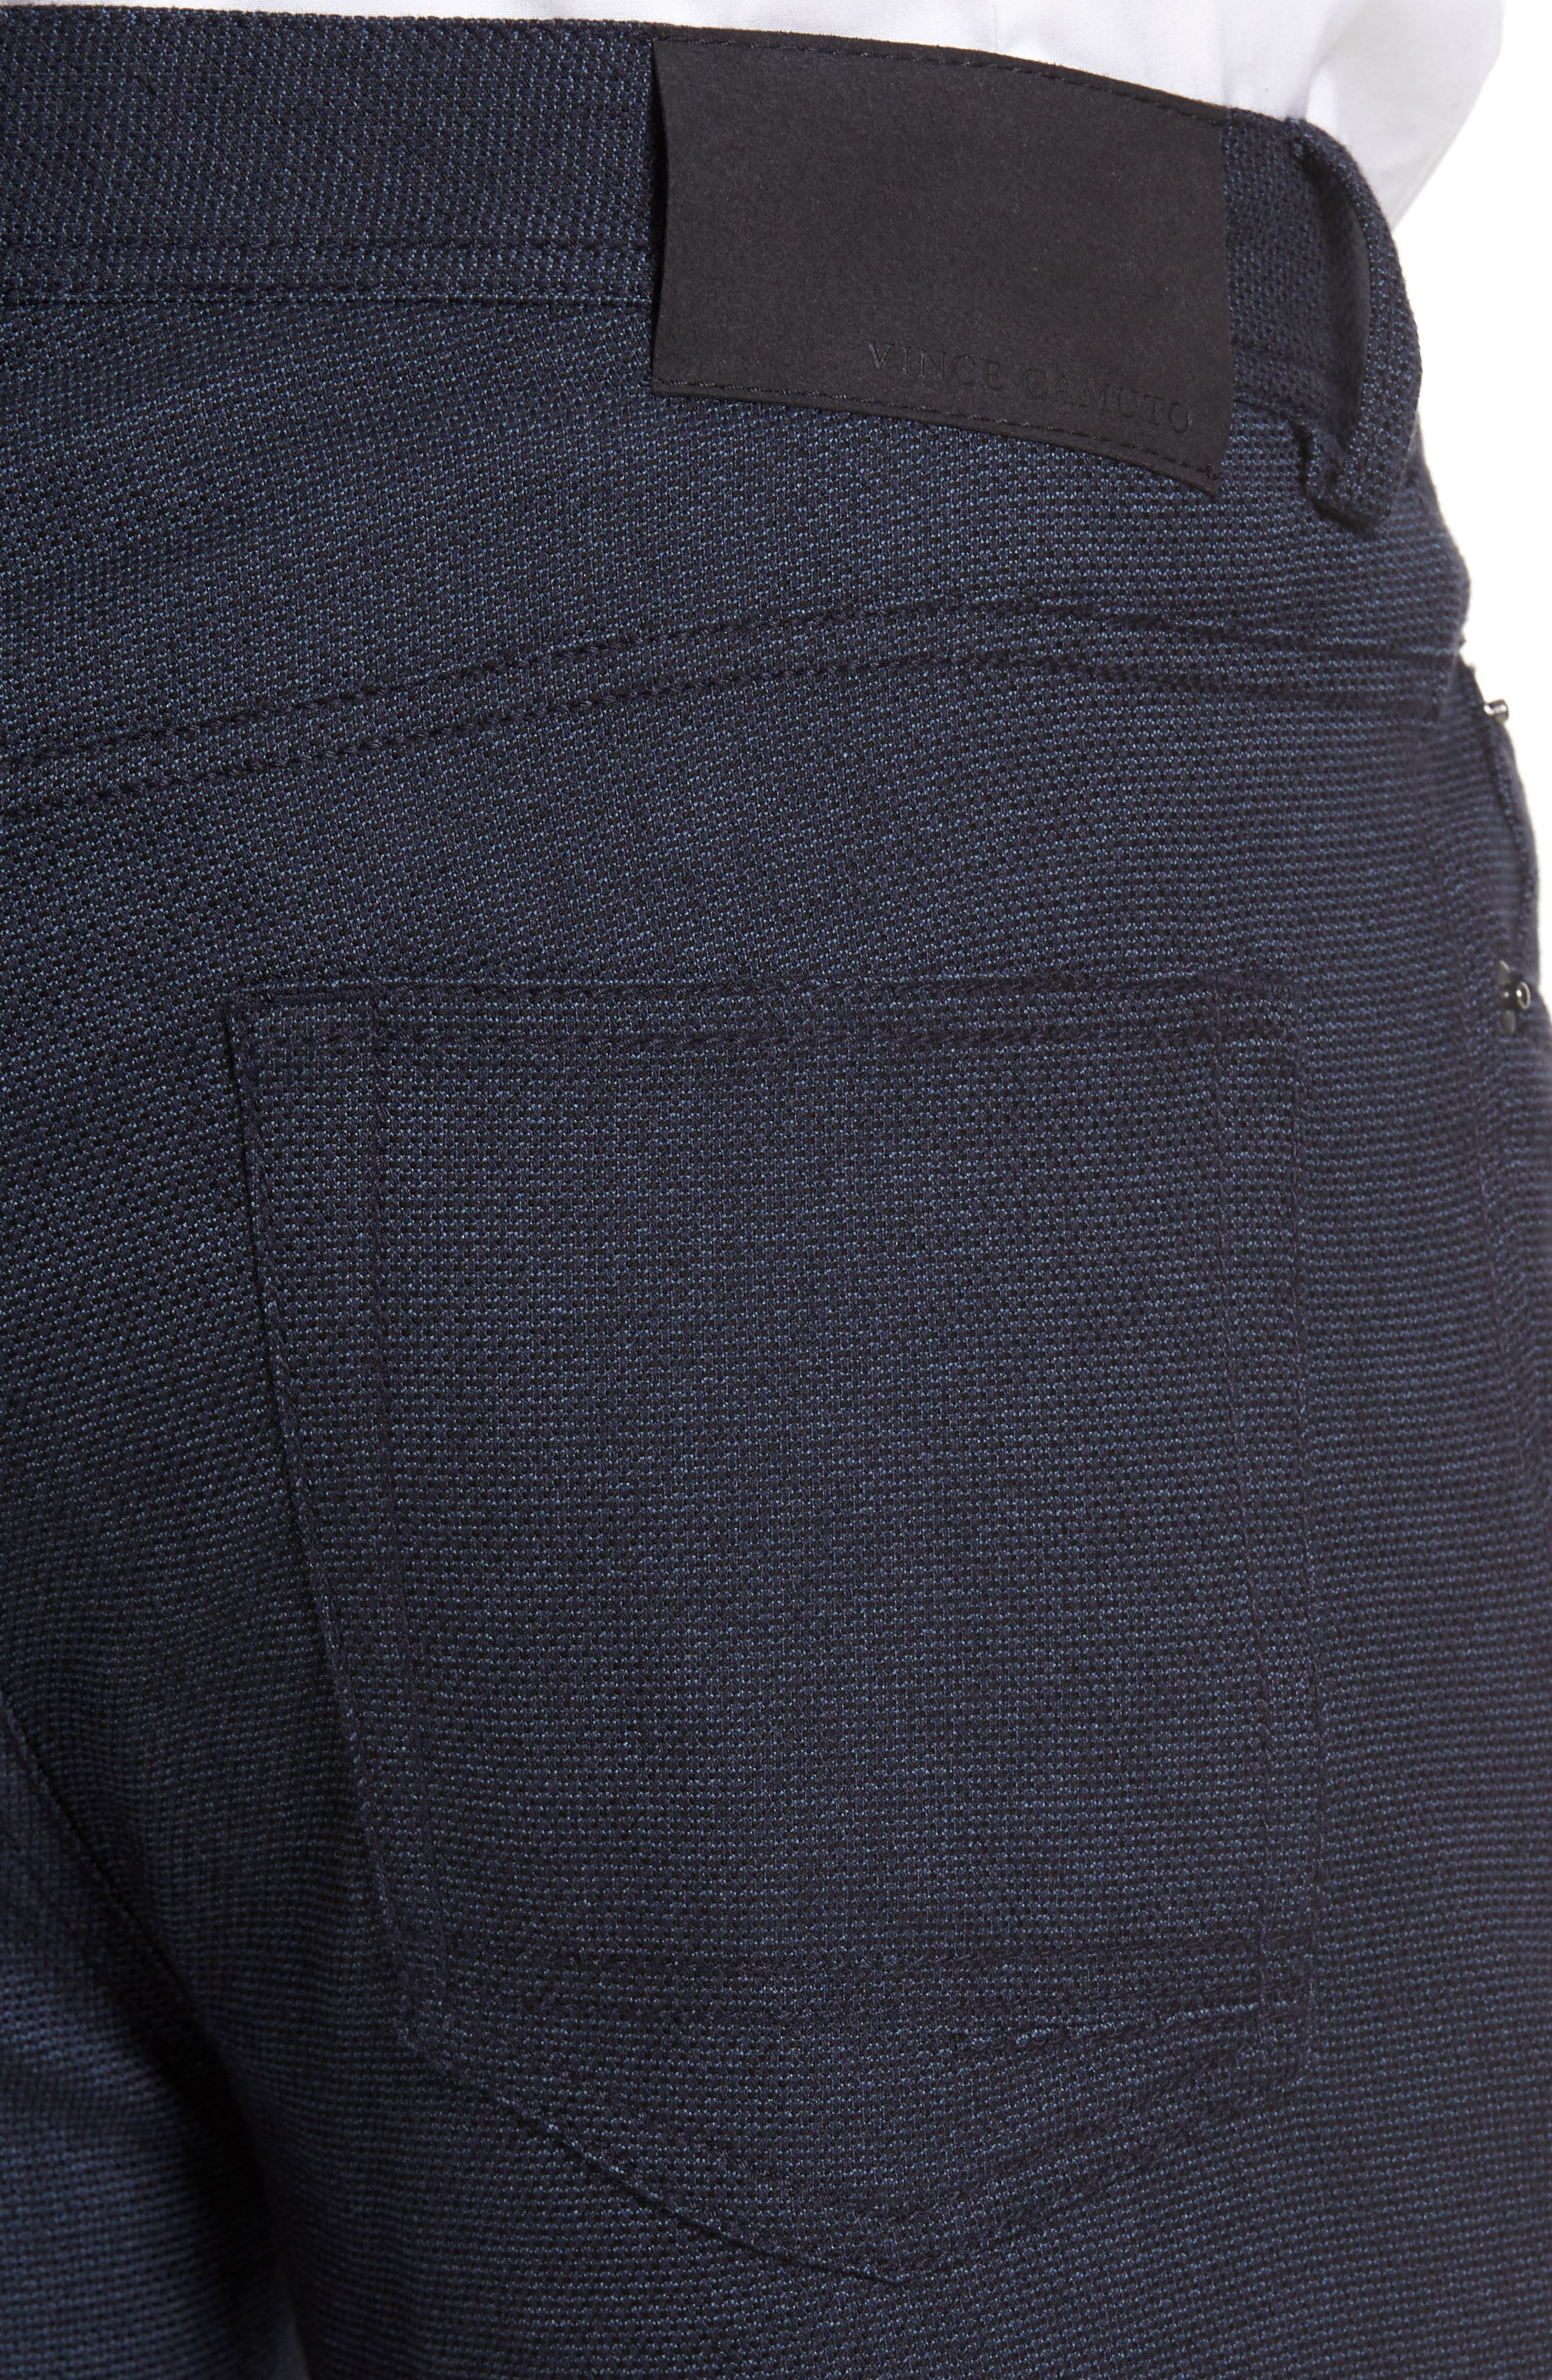 Vince Slim Fit Stretch Five-Pocket Pants,                             Alternate thumbnail 4, color,                             Navy Digital Neat